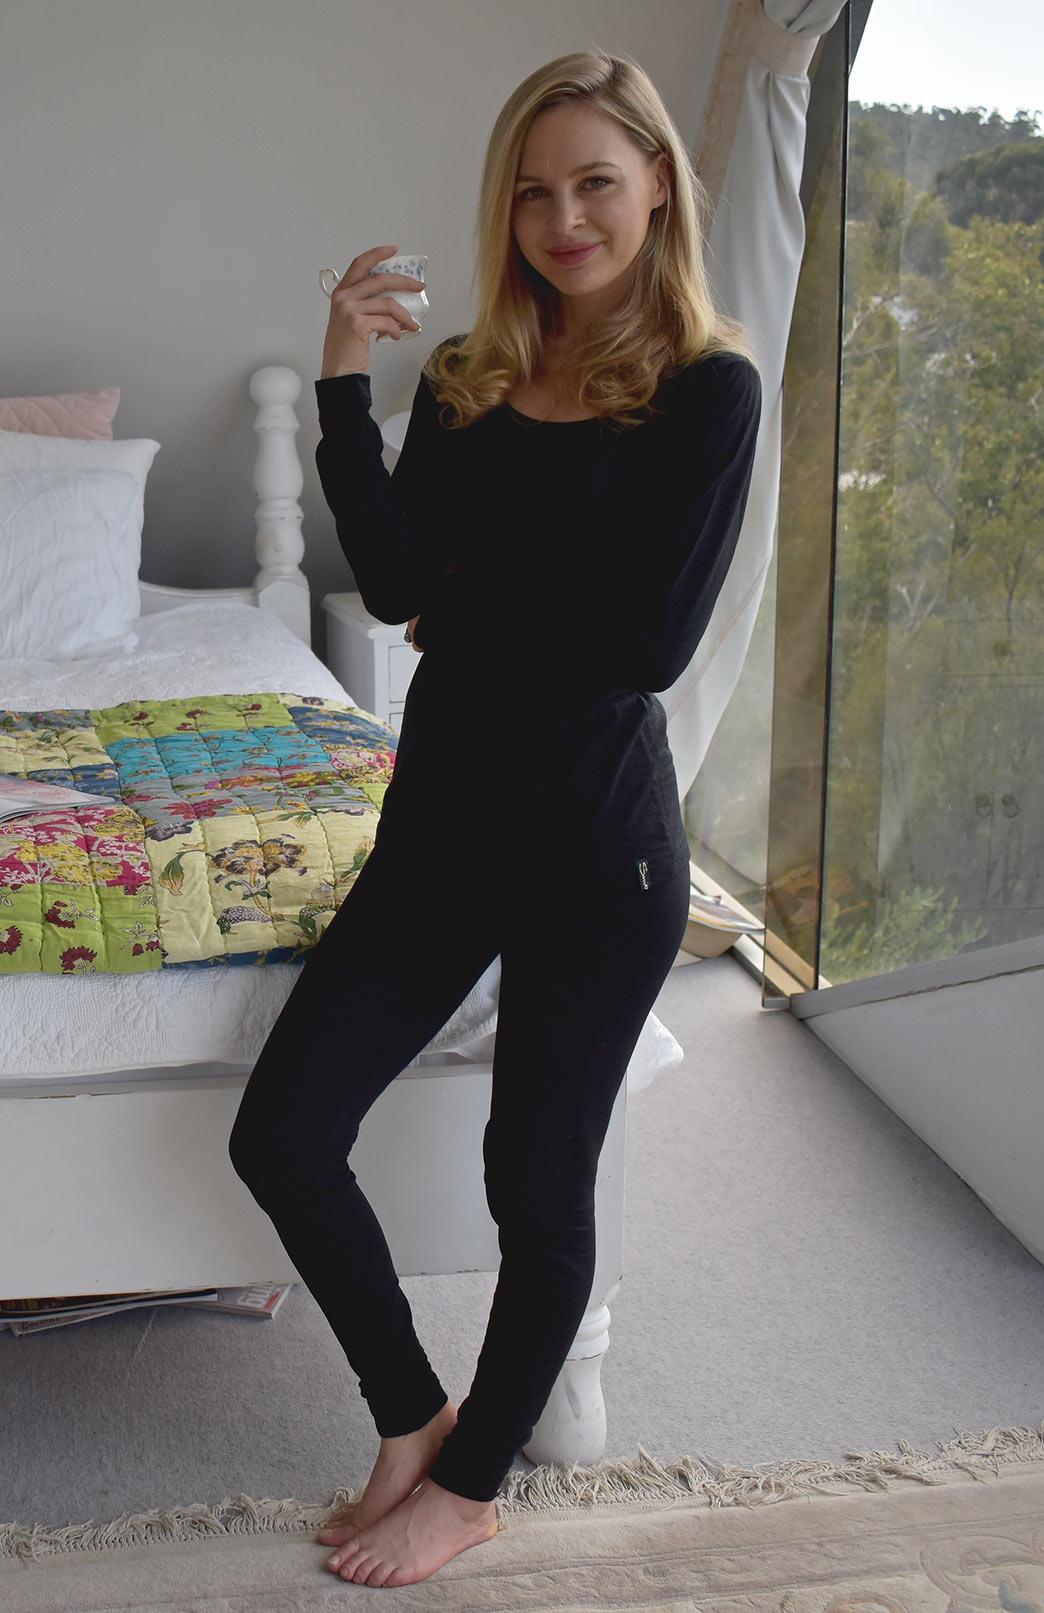 Pyjama Set - Women's Black Merino Wool Matching Pyjama Set of Long Sleeved Top and Tights - Smitten Merino Tasmania Australia